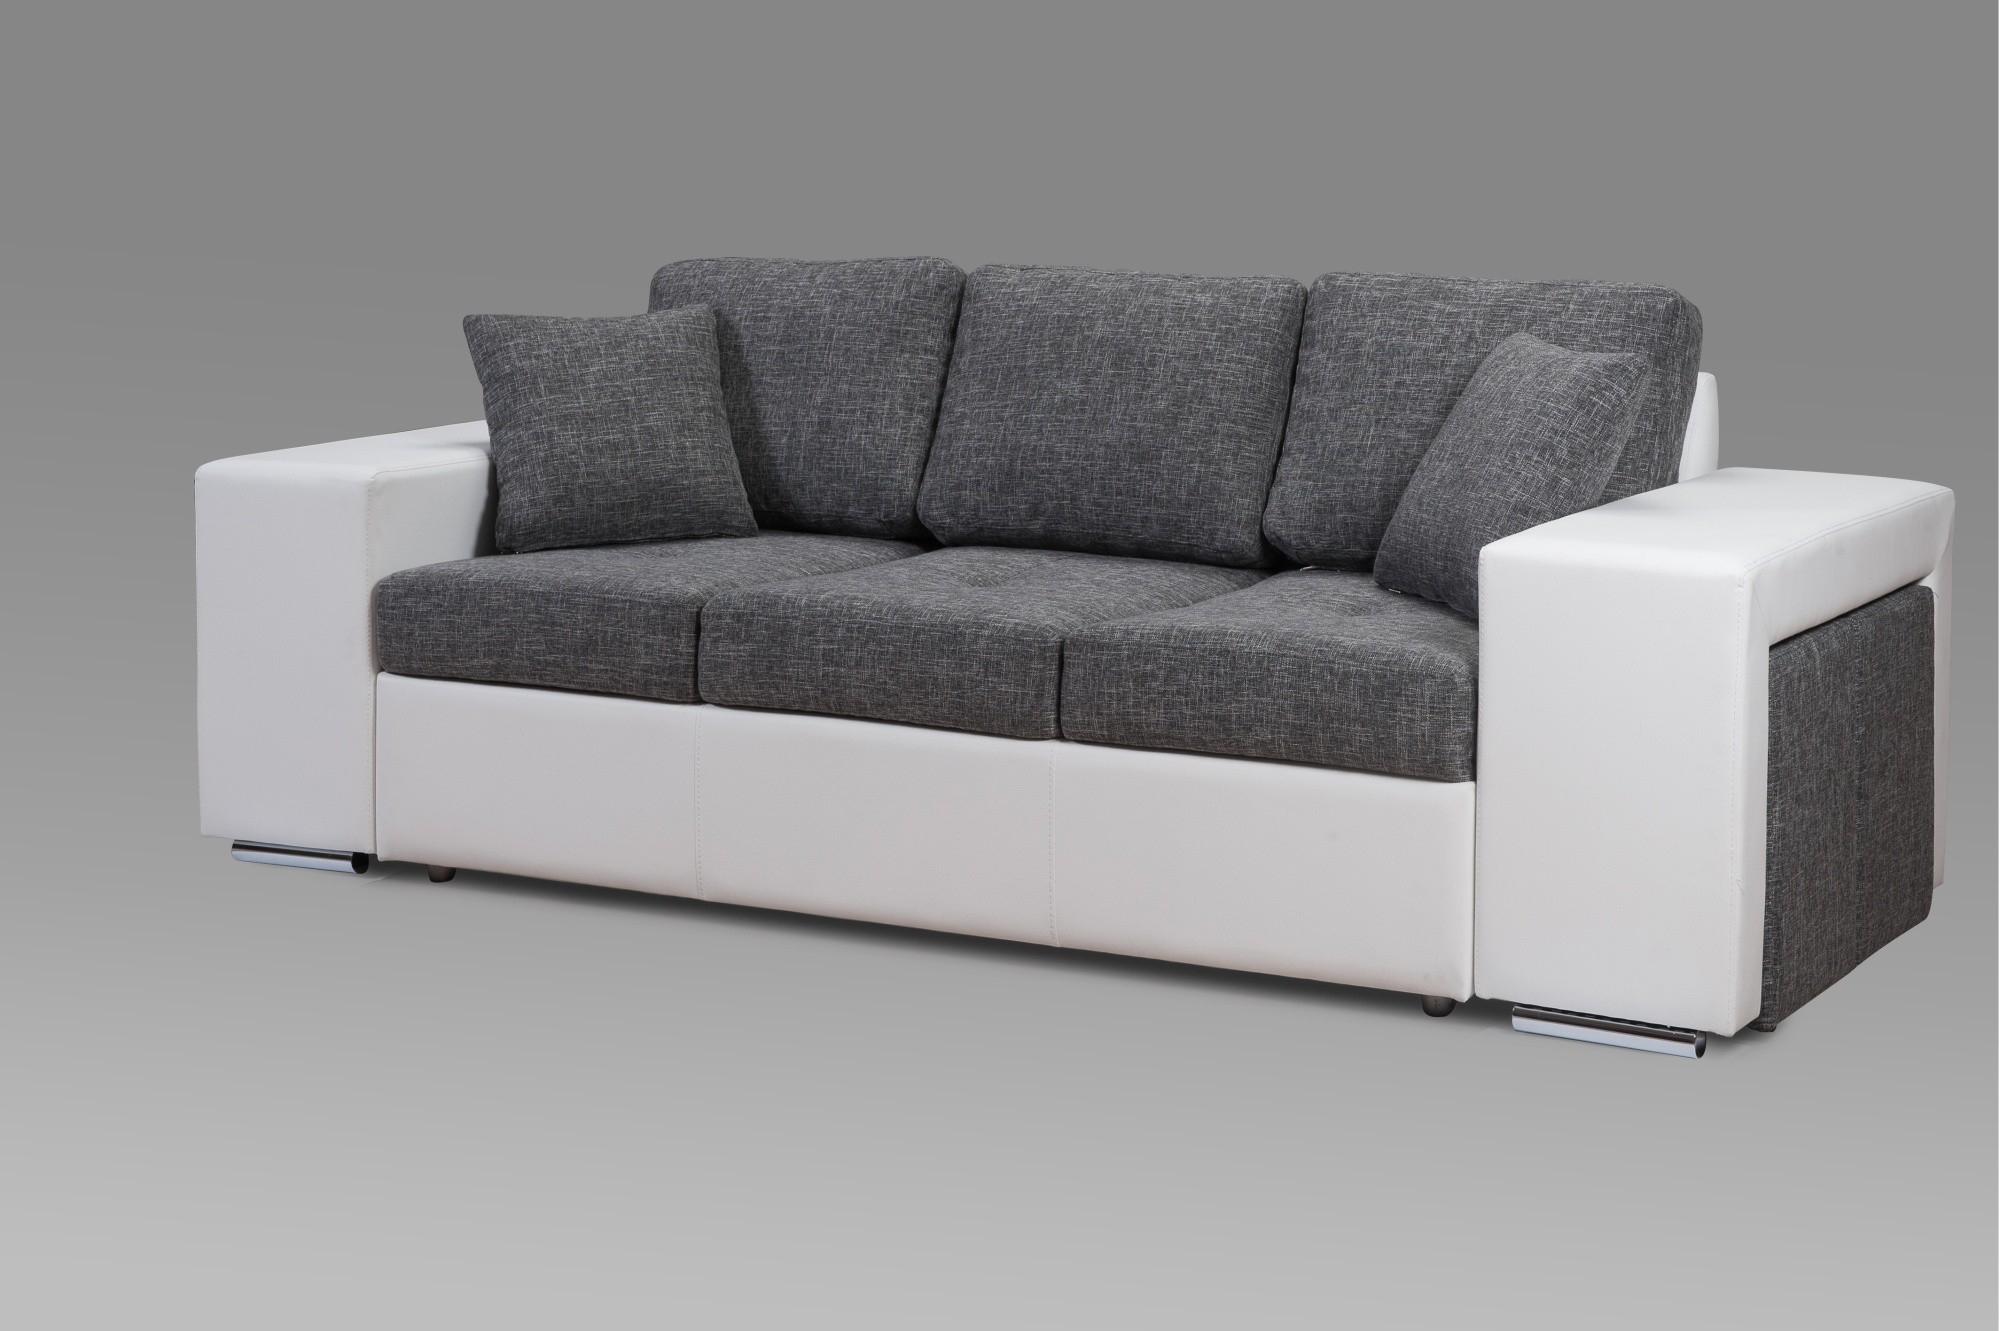 Canapé Vicky Alinea Impressionnant Collection soldes Canape Conforama Maison Design Wiblia